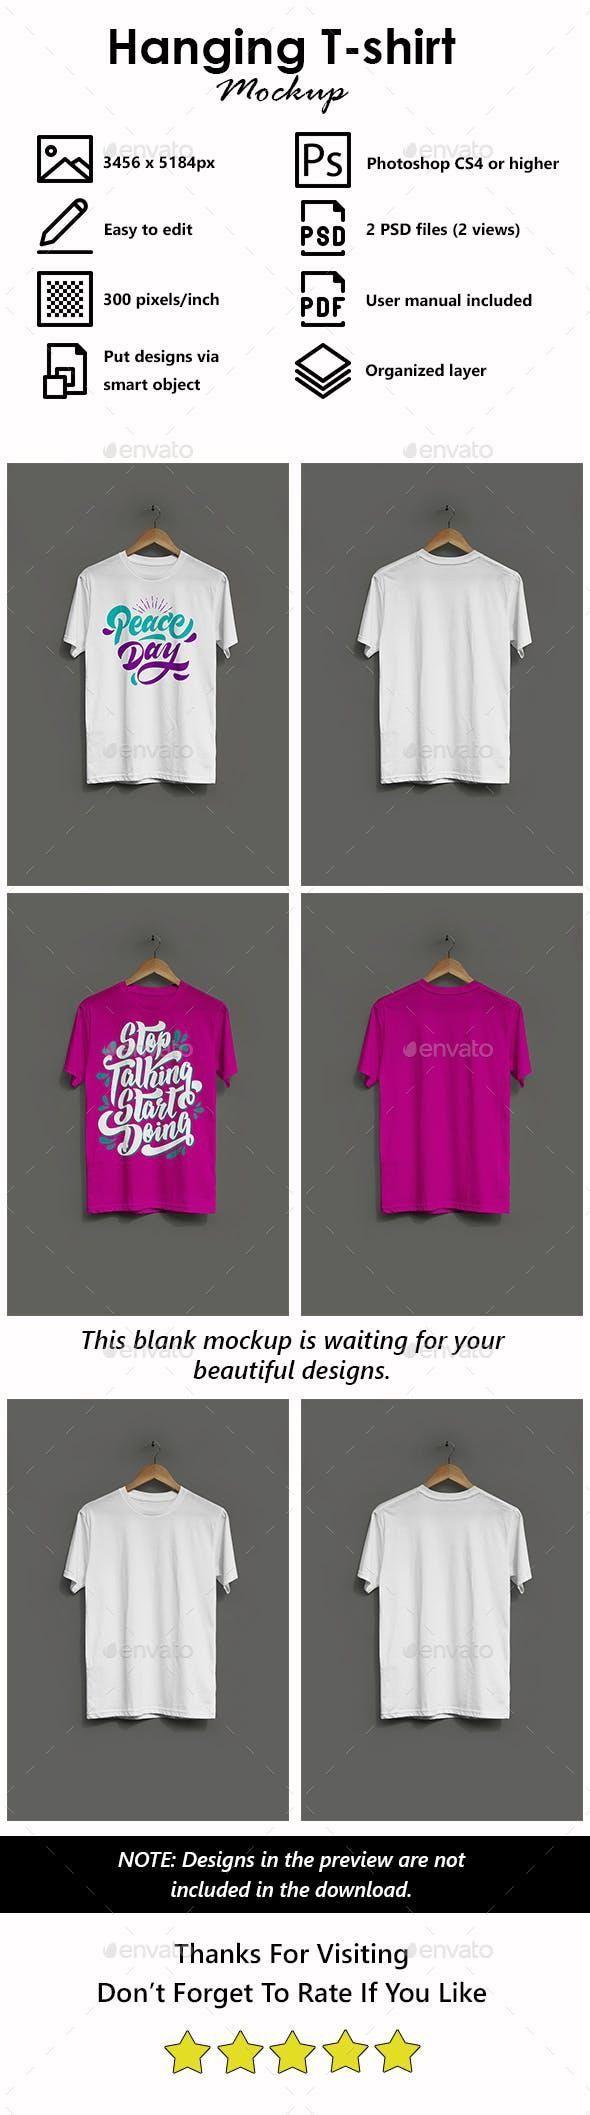 Download Hanging T Shirt Mockup Appareltemplates Psdtemplate Productmockup Graphic Apparelmockup Clothingmockup Mockup Clothing Mockup Tshirt Mockup Shirt Mockup